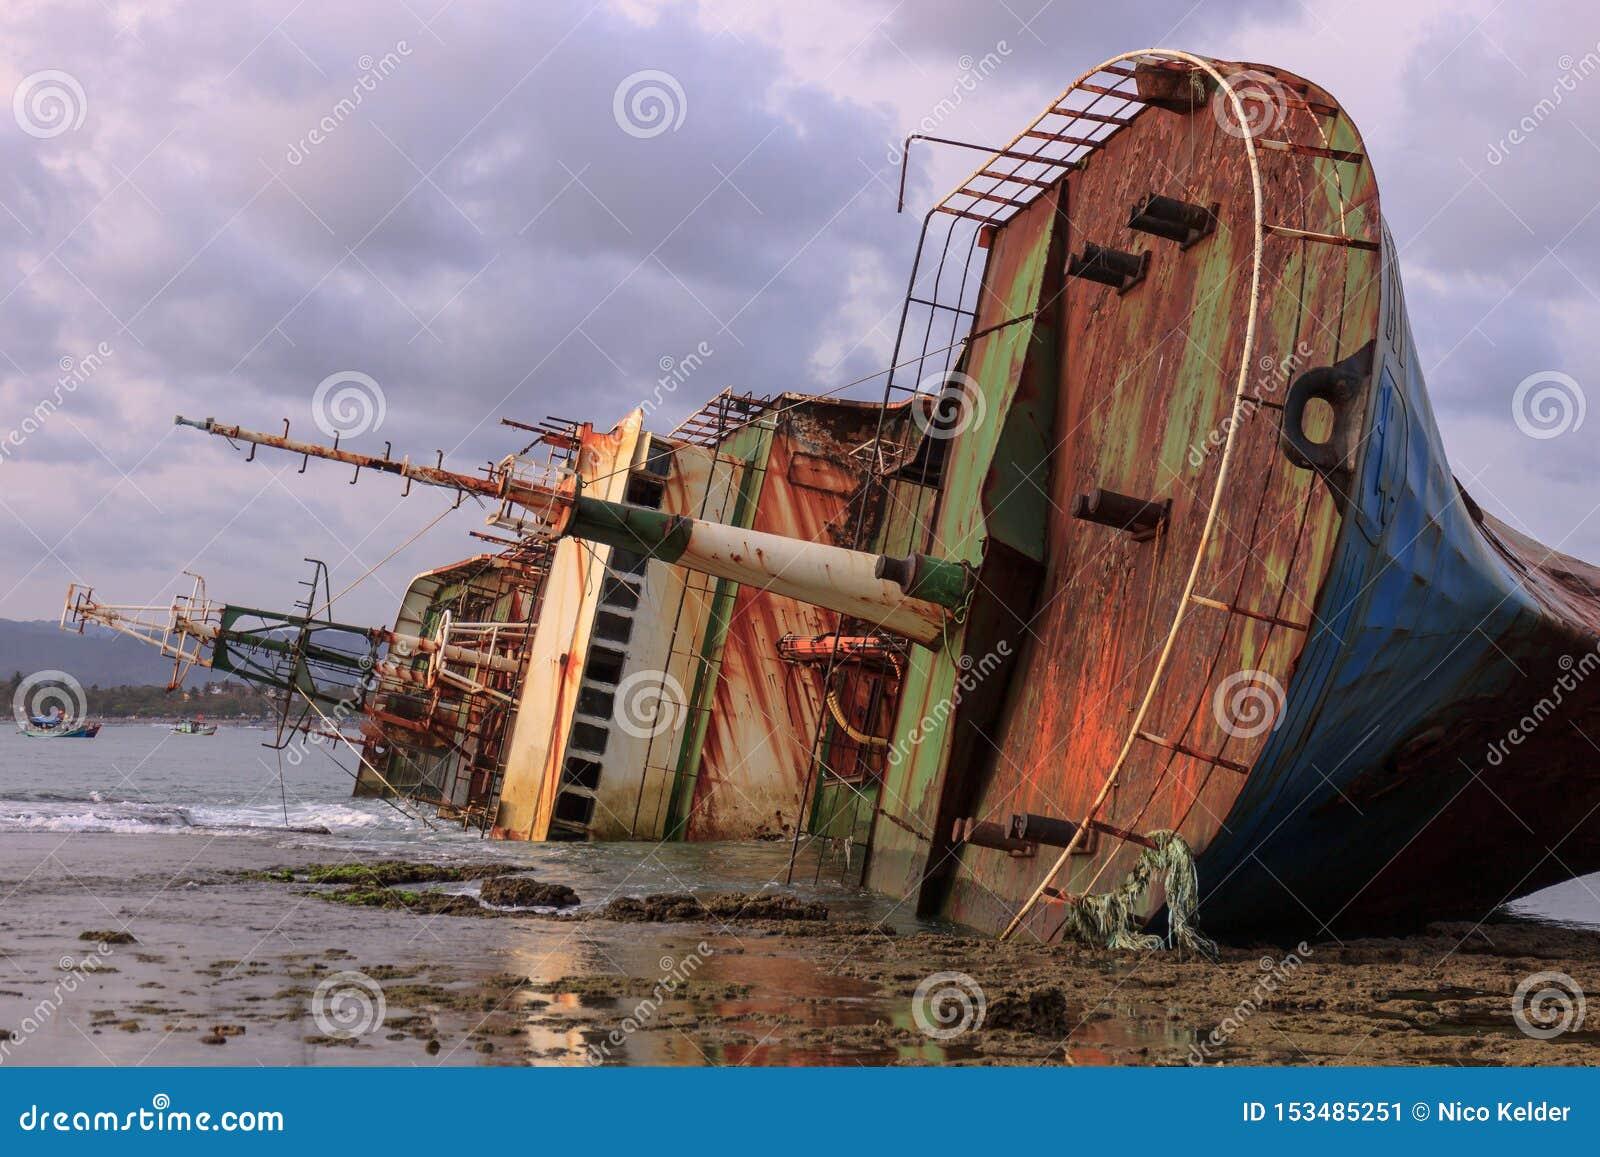 Wywracający się Bangkai Kapal FV Viking statek